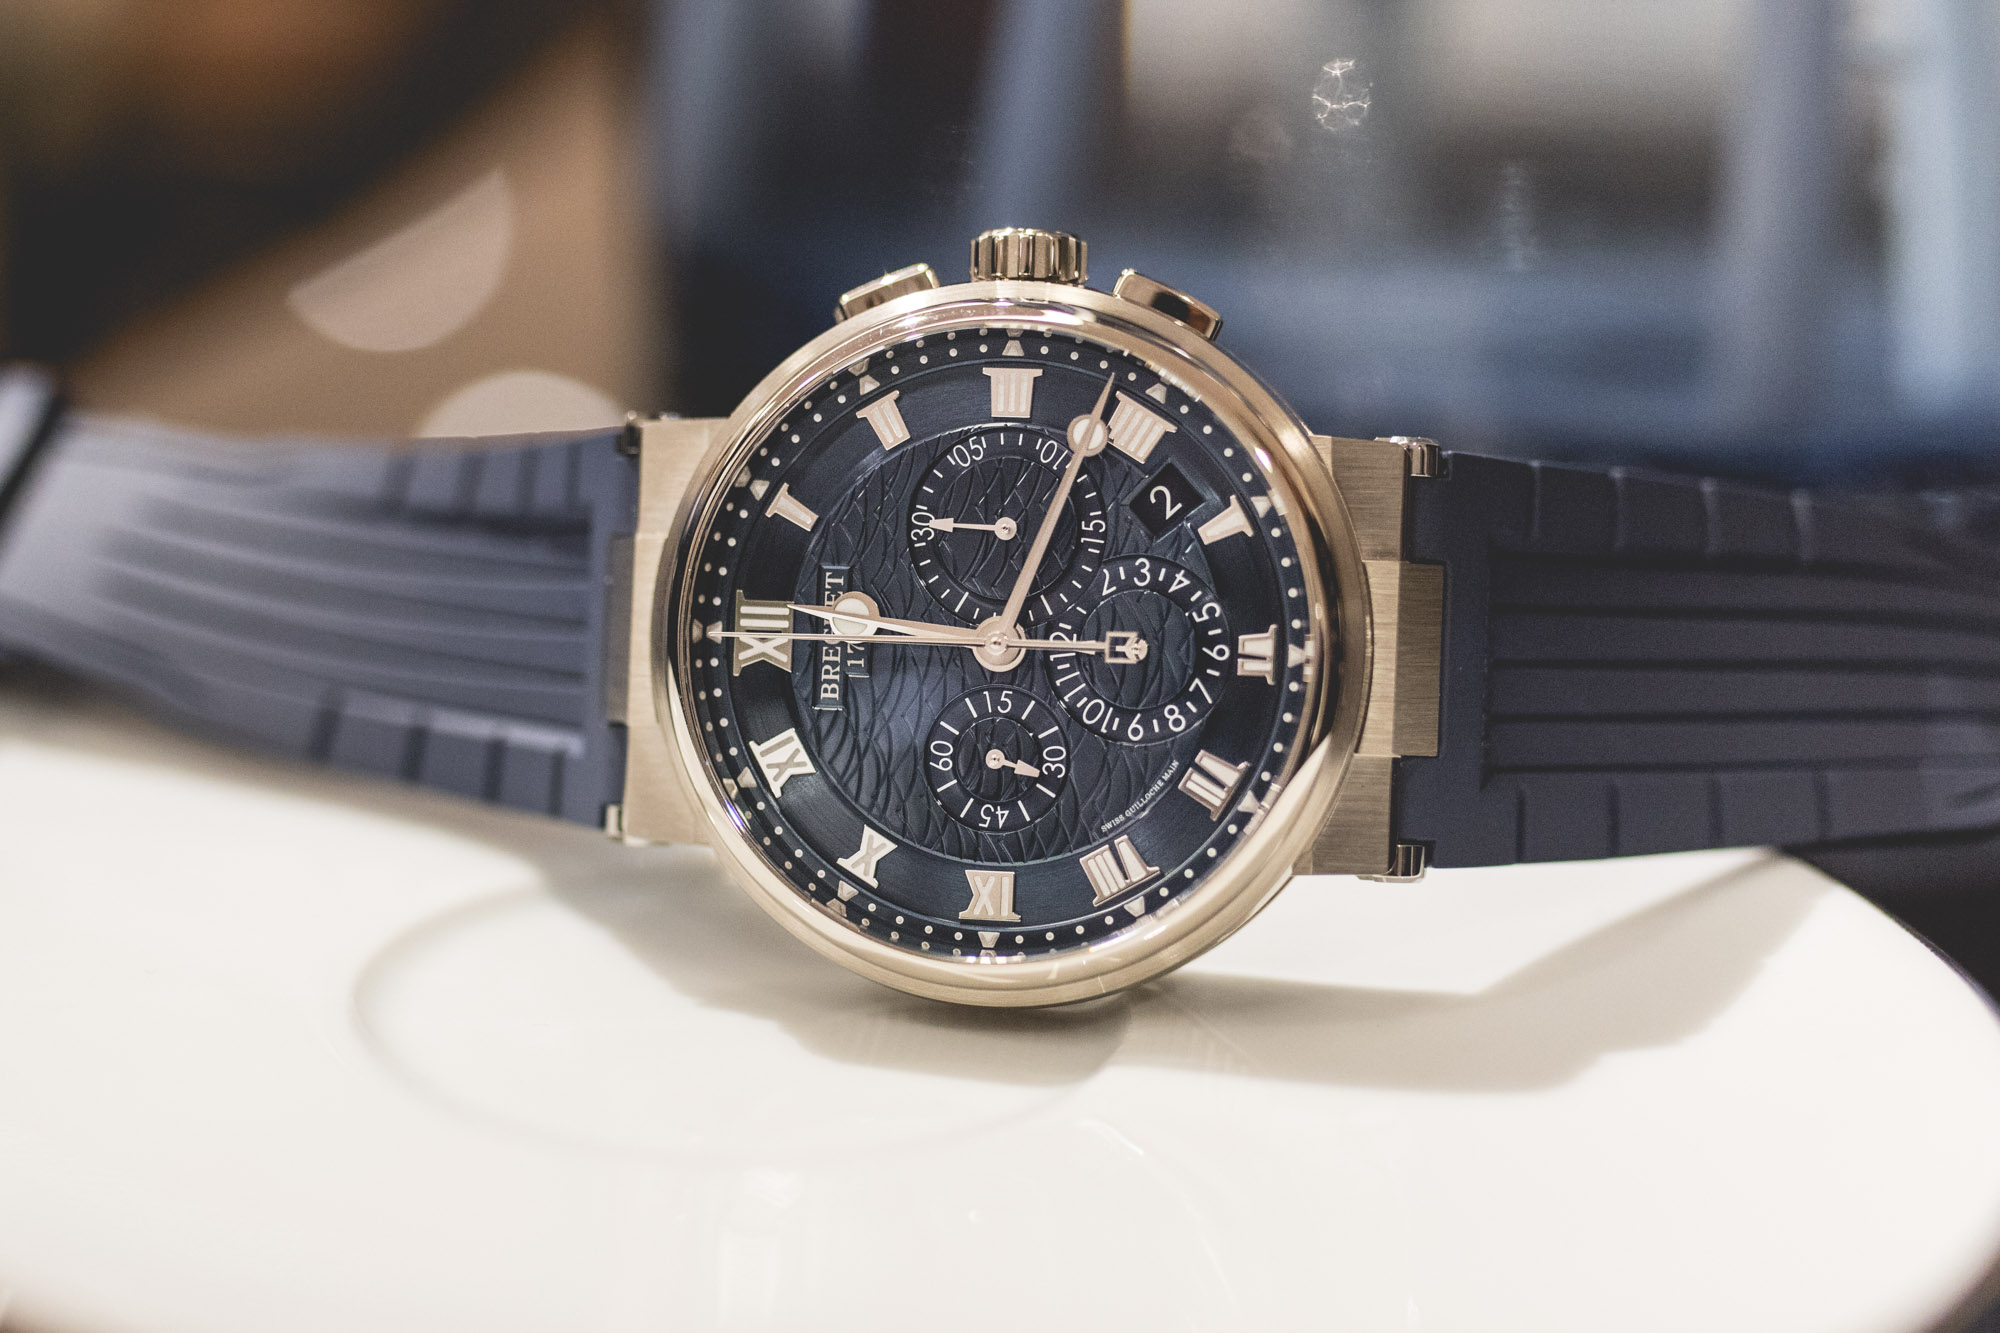 Baselworld 2018 - Breguet Marine Chronographe 5527